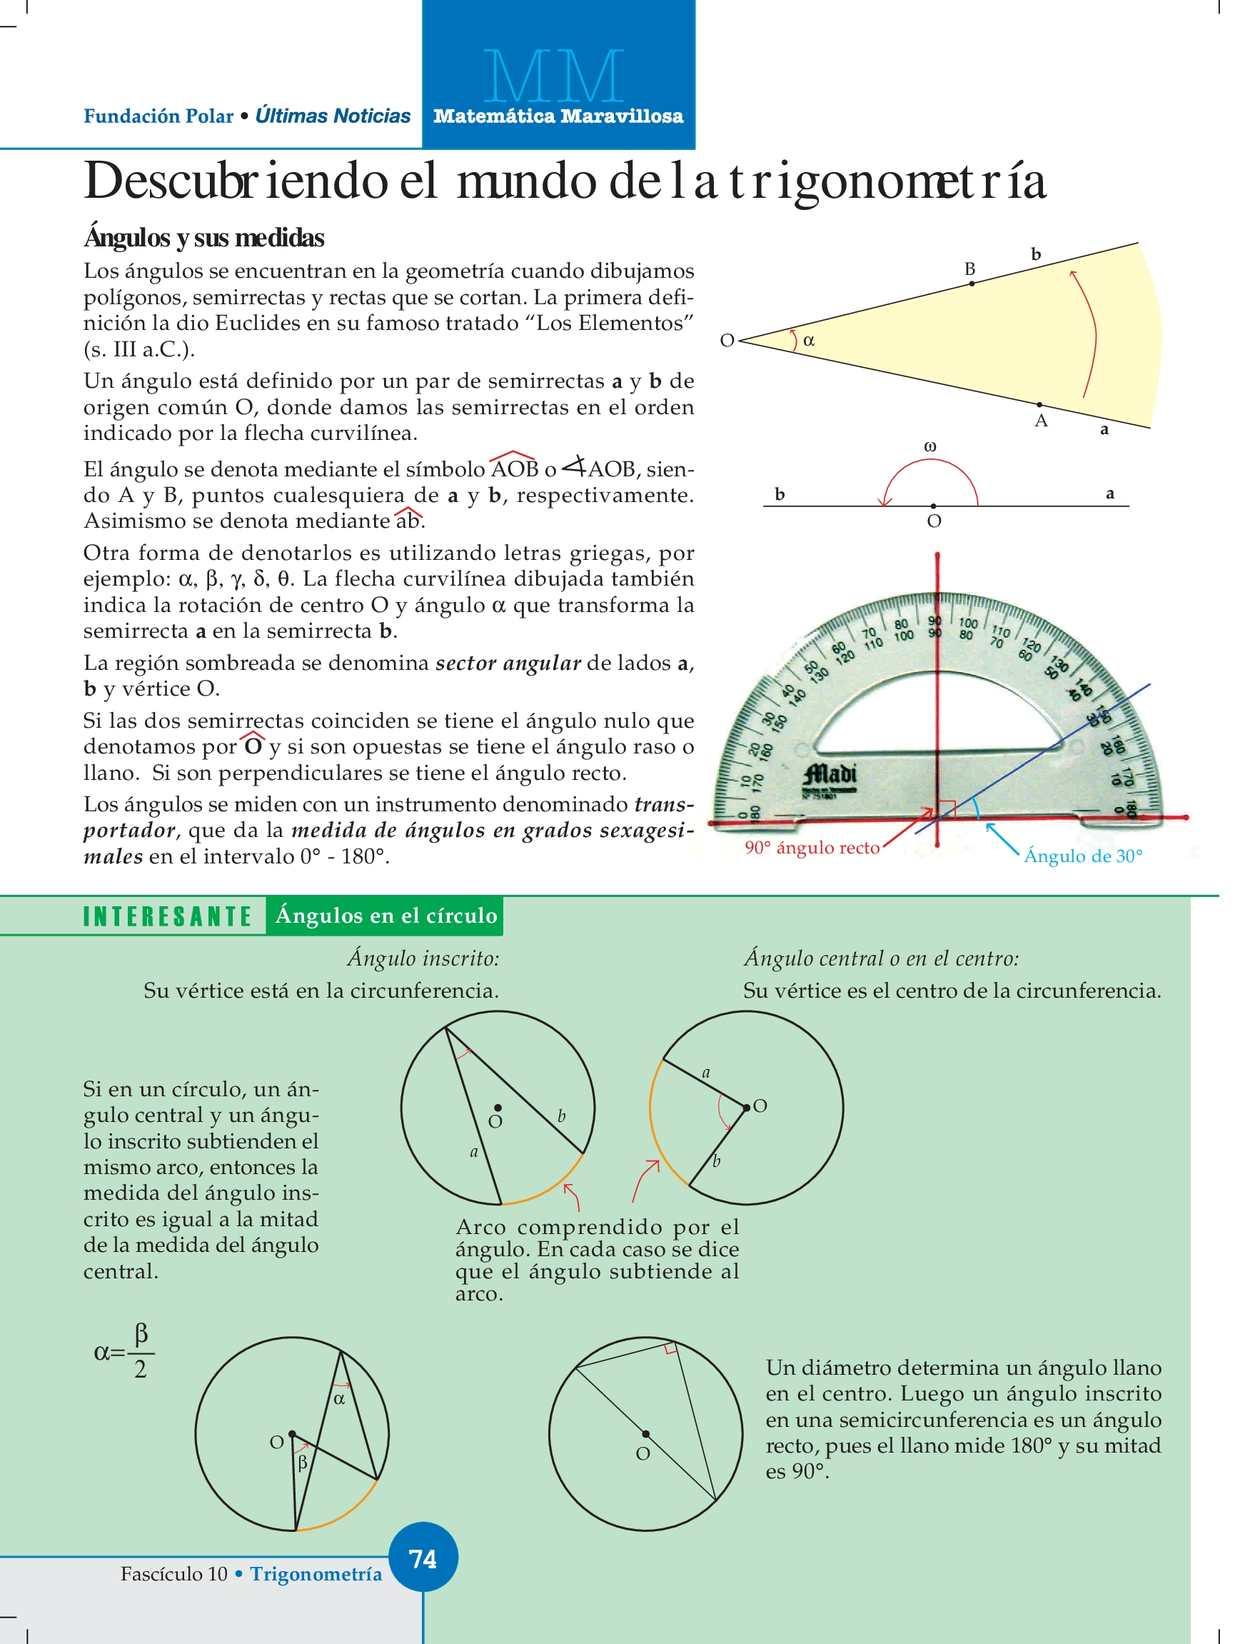 Fundacion Polar Matemáticas Maravillosas - CALAMEO Downloader